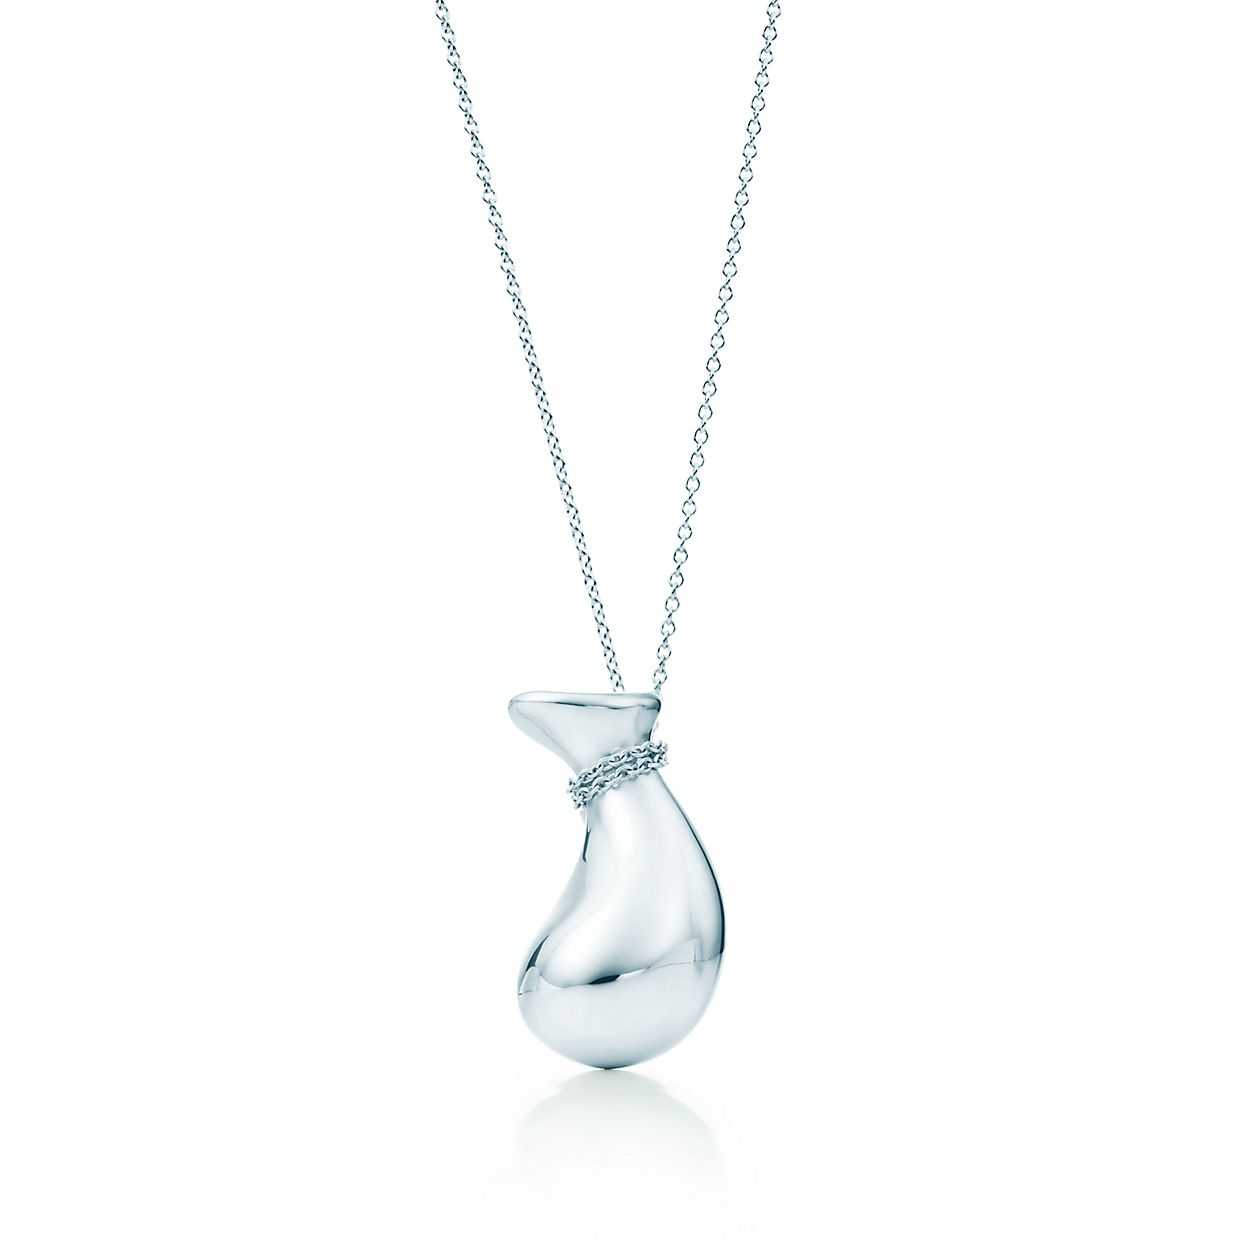 Elsa Peretti Bottle jug pendant in sterling silver, small Tiffany & Co.